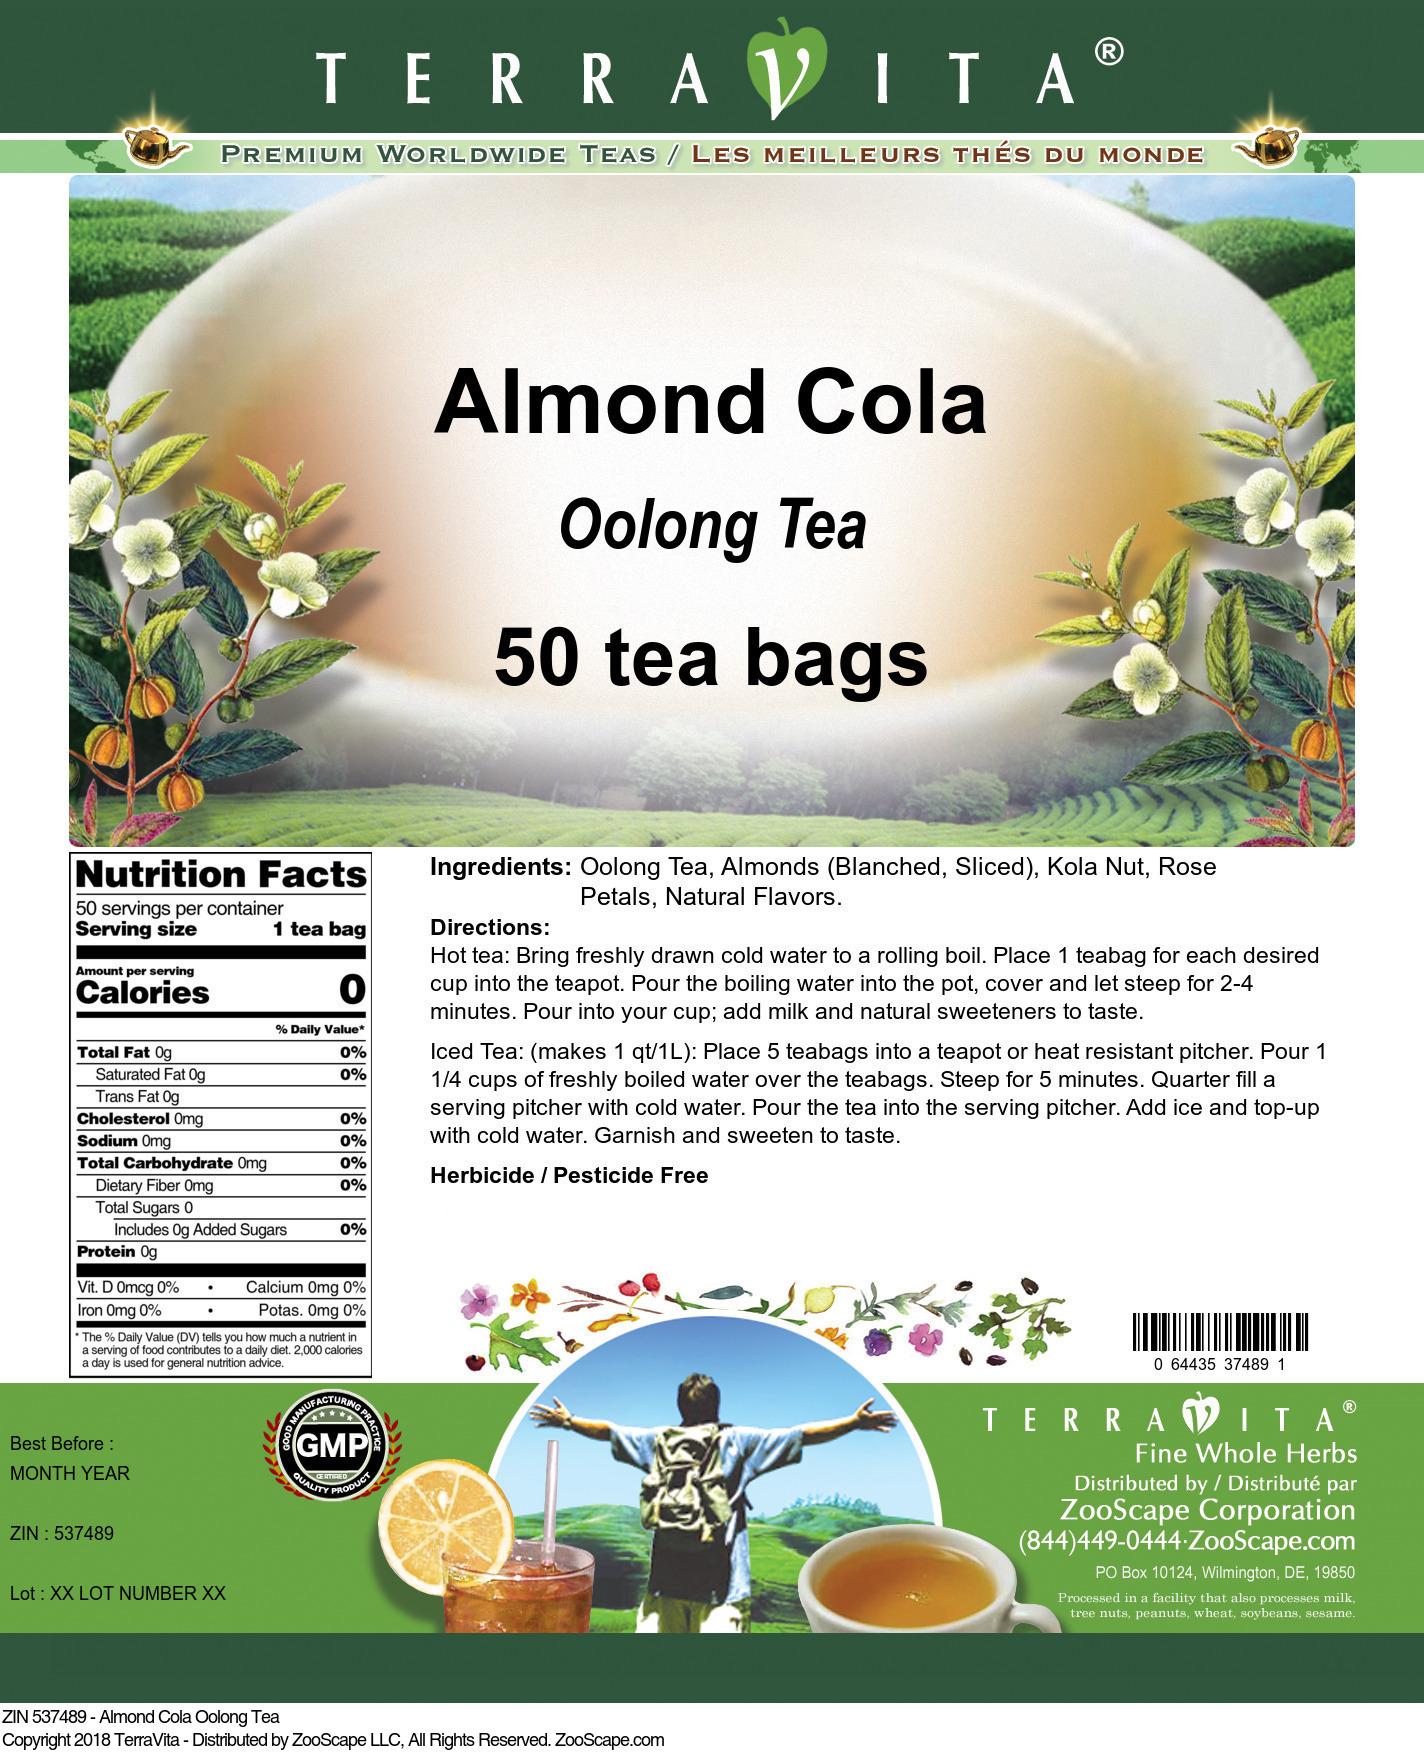 Almond Cola Oolong Tea